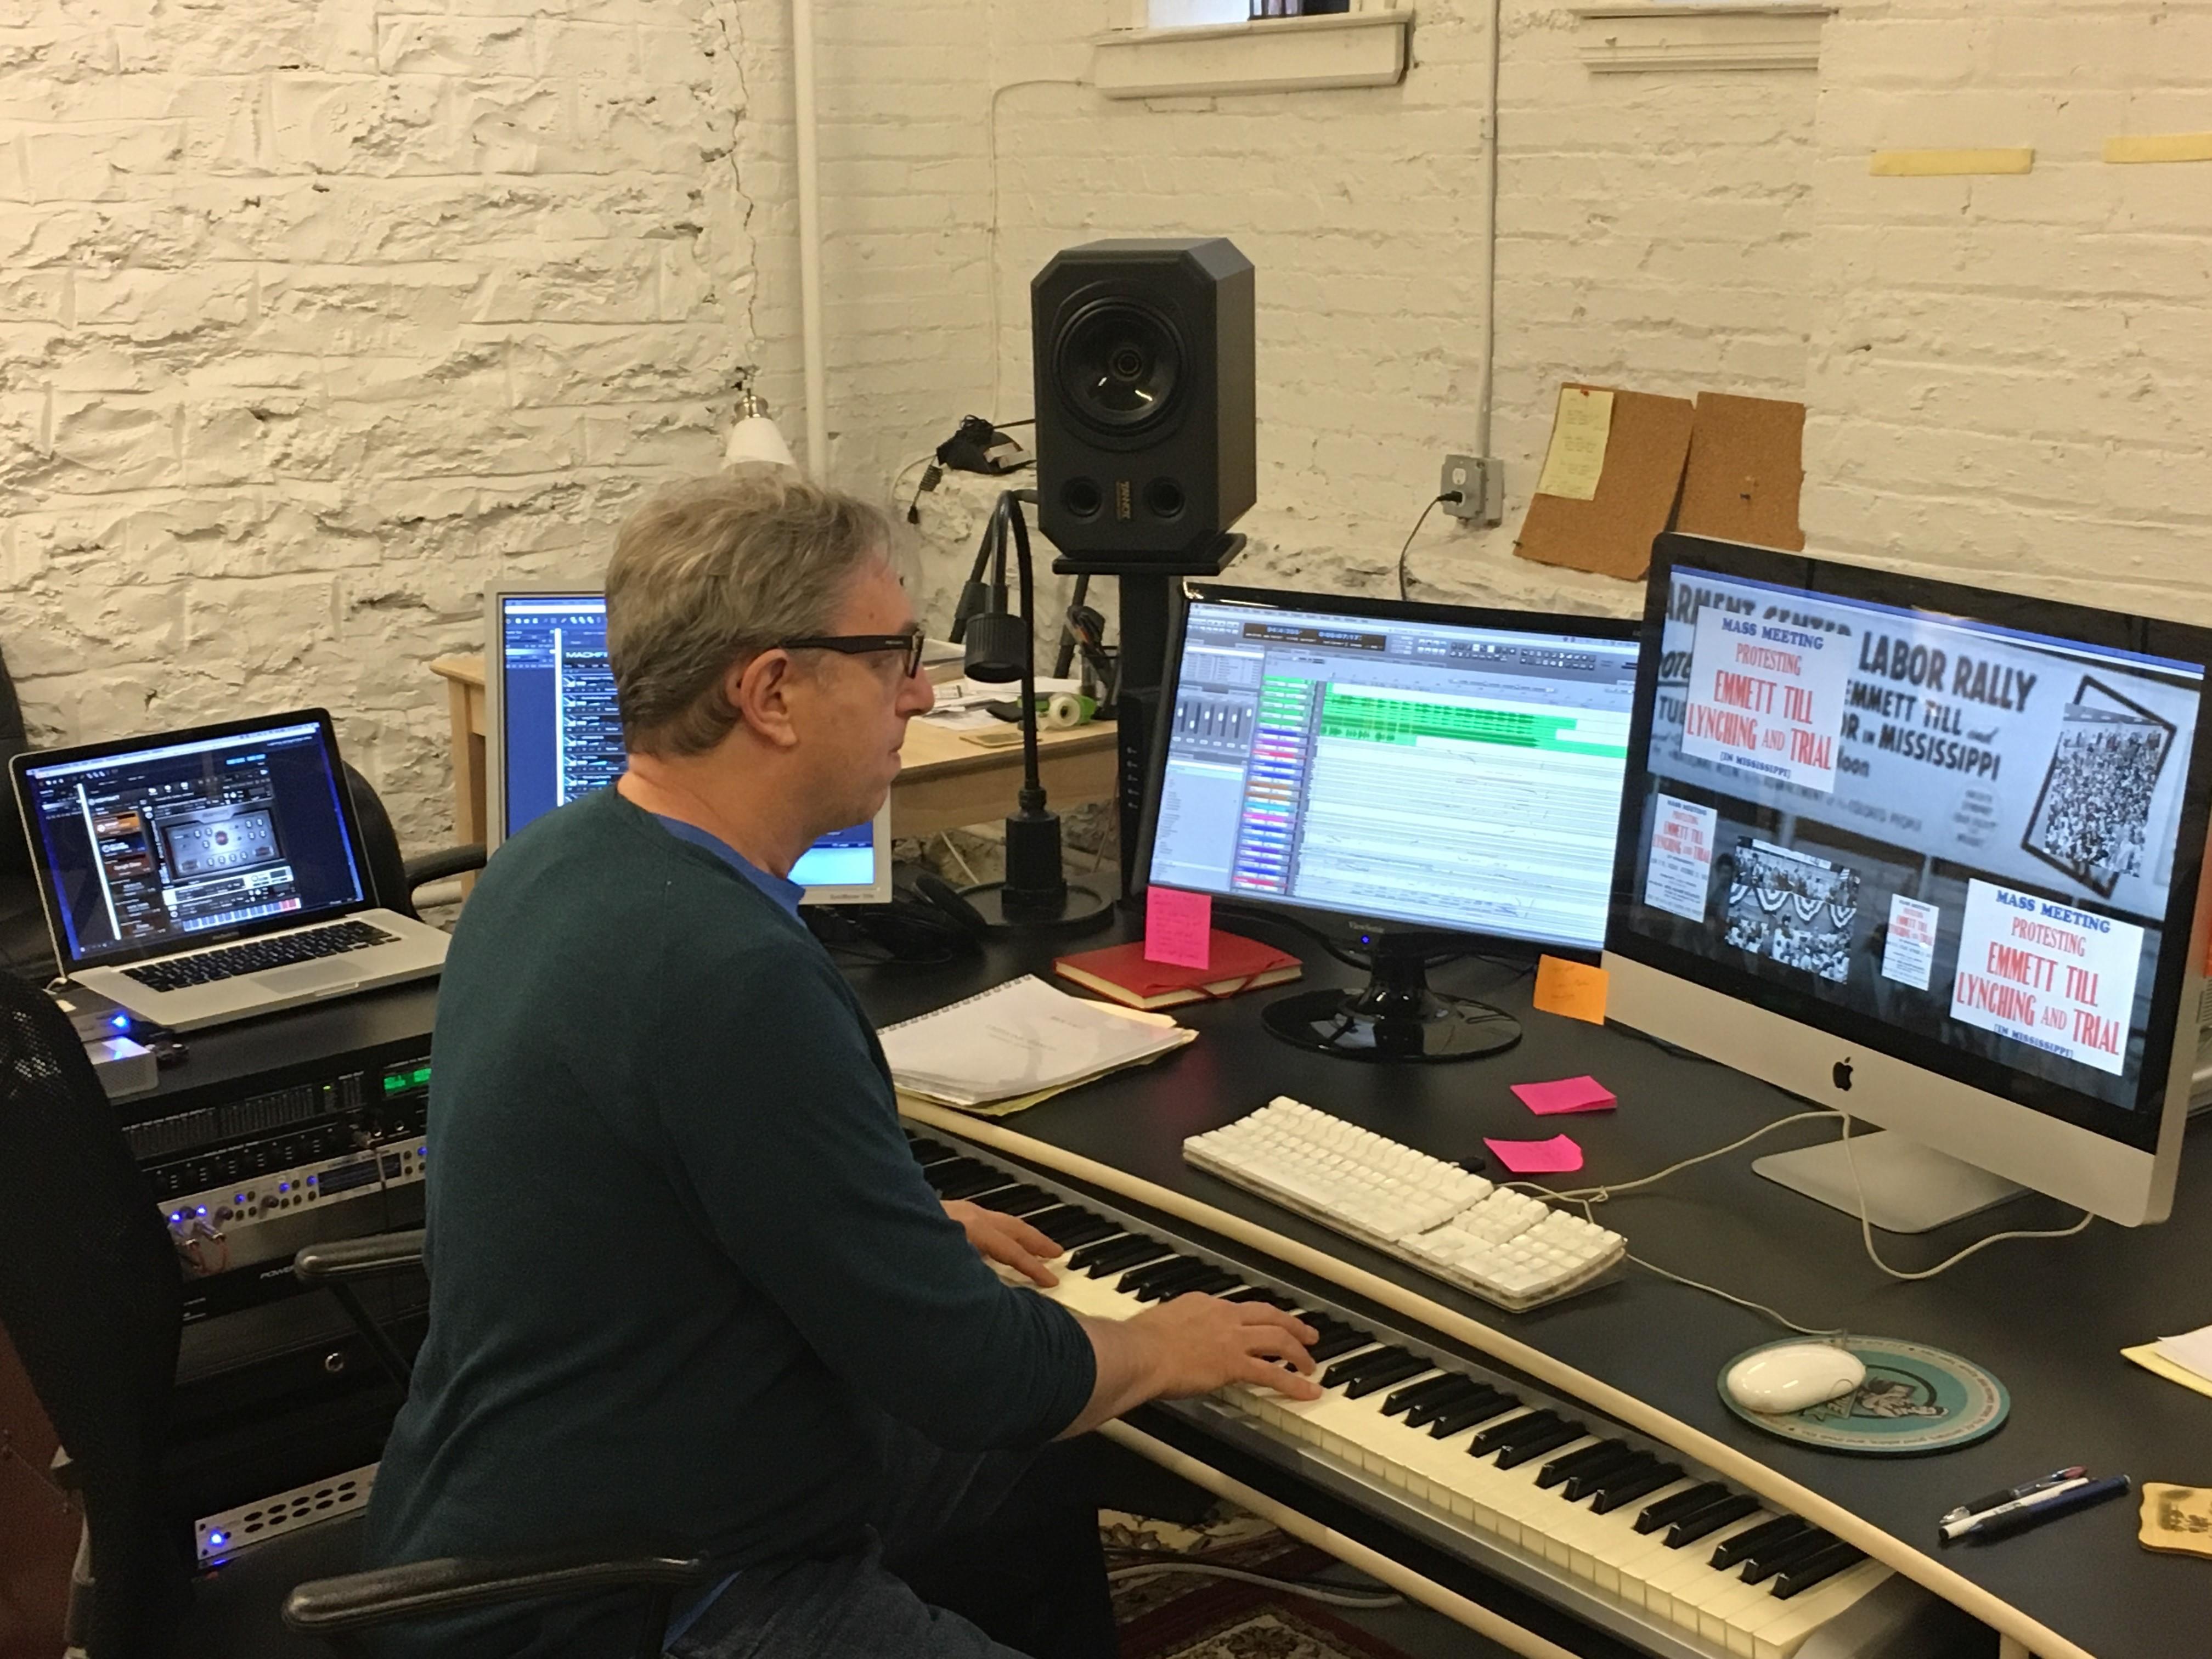 Rick Baitz working on the final revisions of his score for Monadnock Media's Emmett Till documentary.